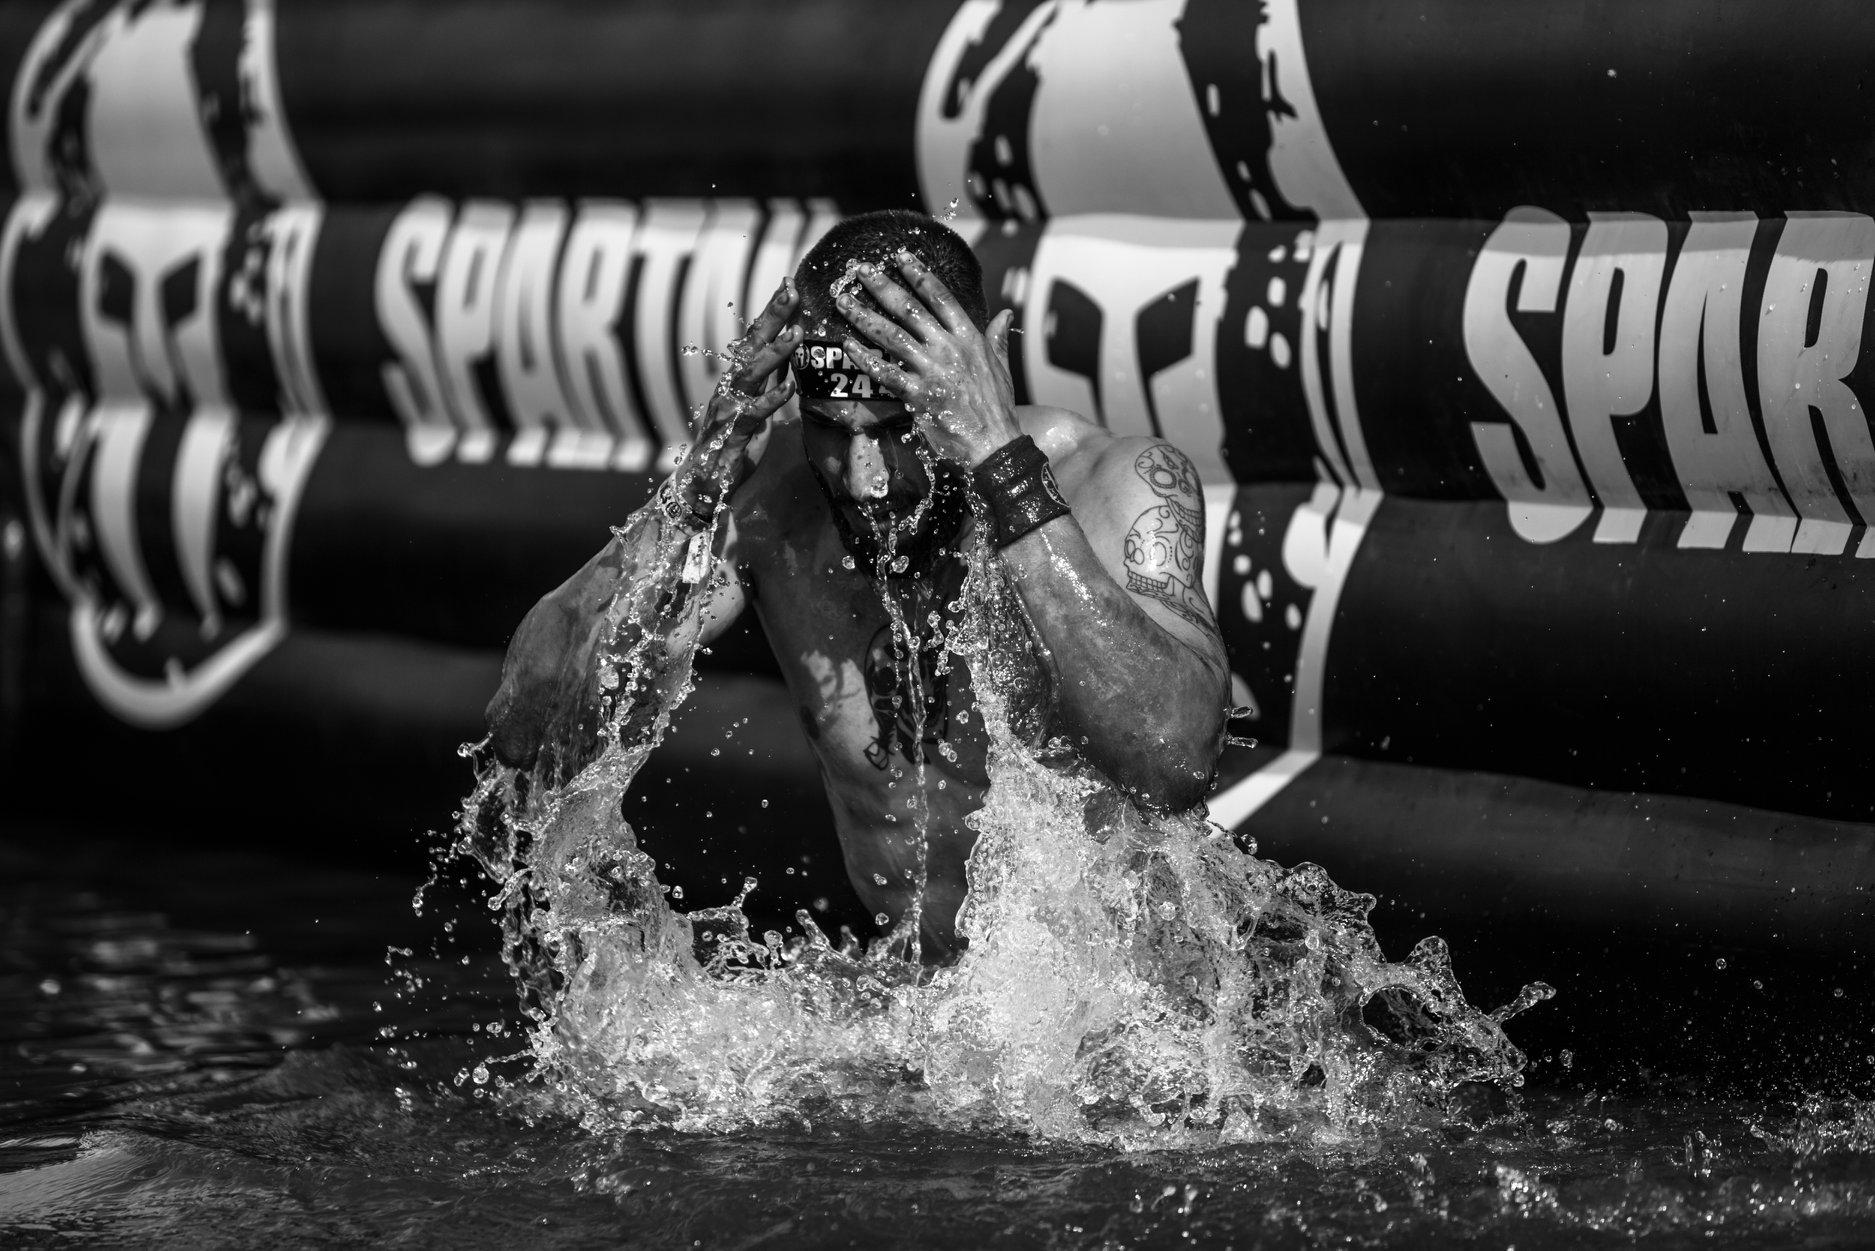 Spartan Race 2019 terá estrutura inédita no Brasil - Foto: Reprodução/Facebook